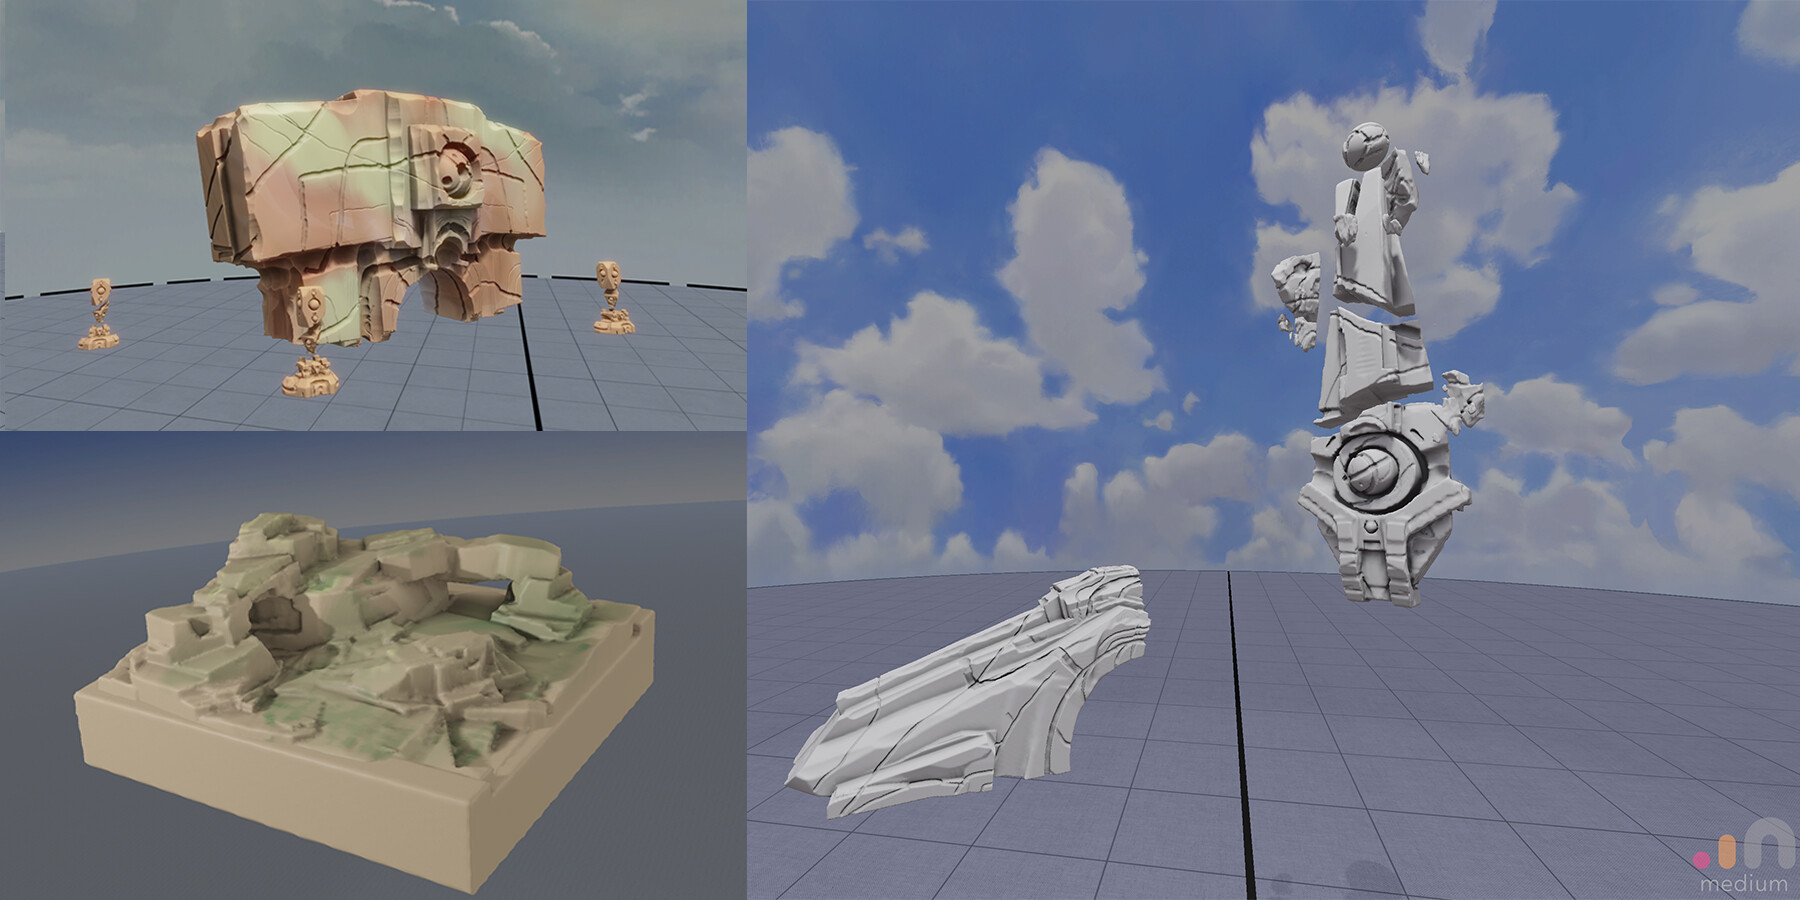 Brian higgins oculusmedium sketches ruins